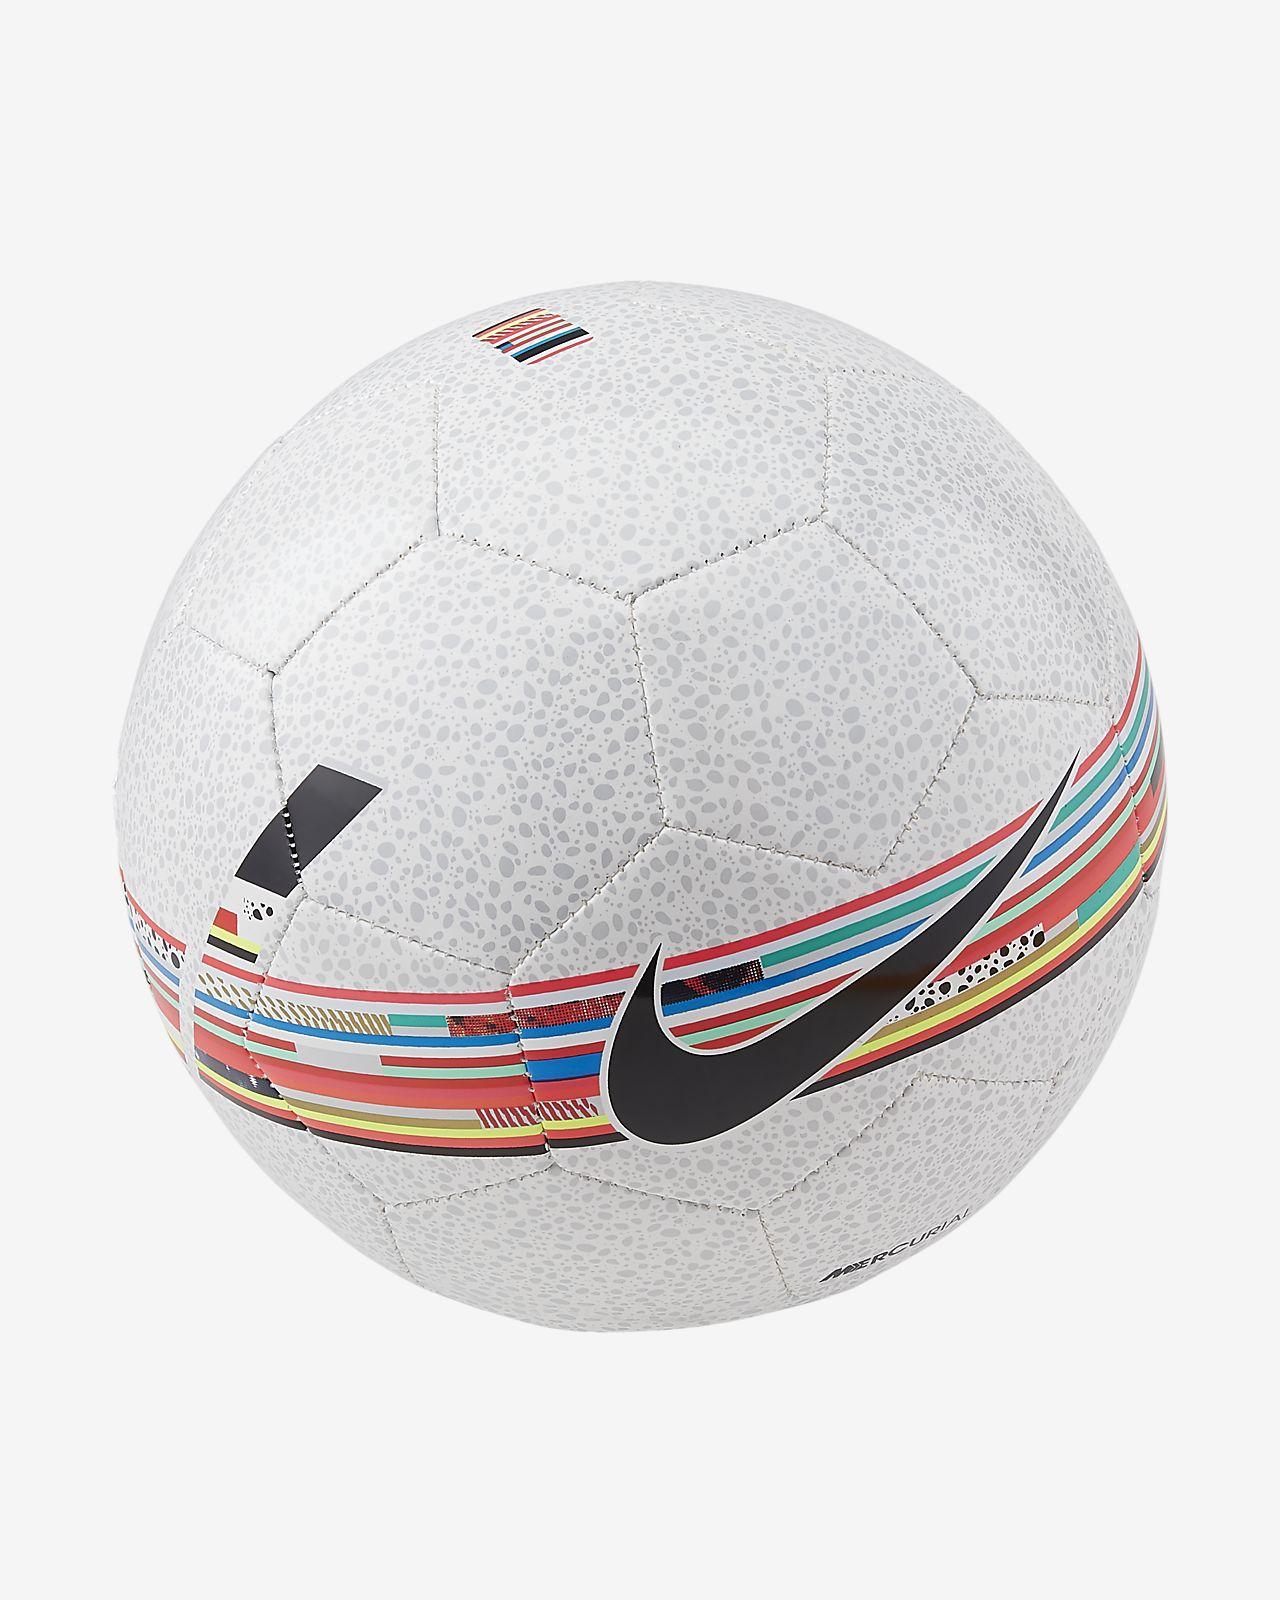 Balón de fútbol Nike Mercurial Prestige